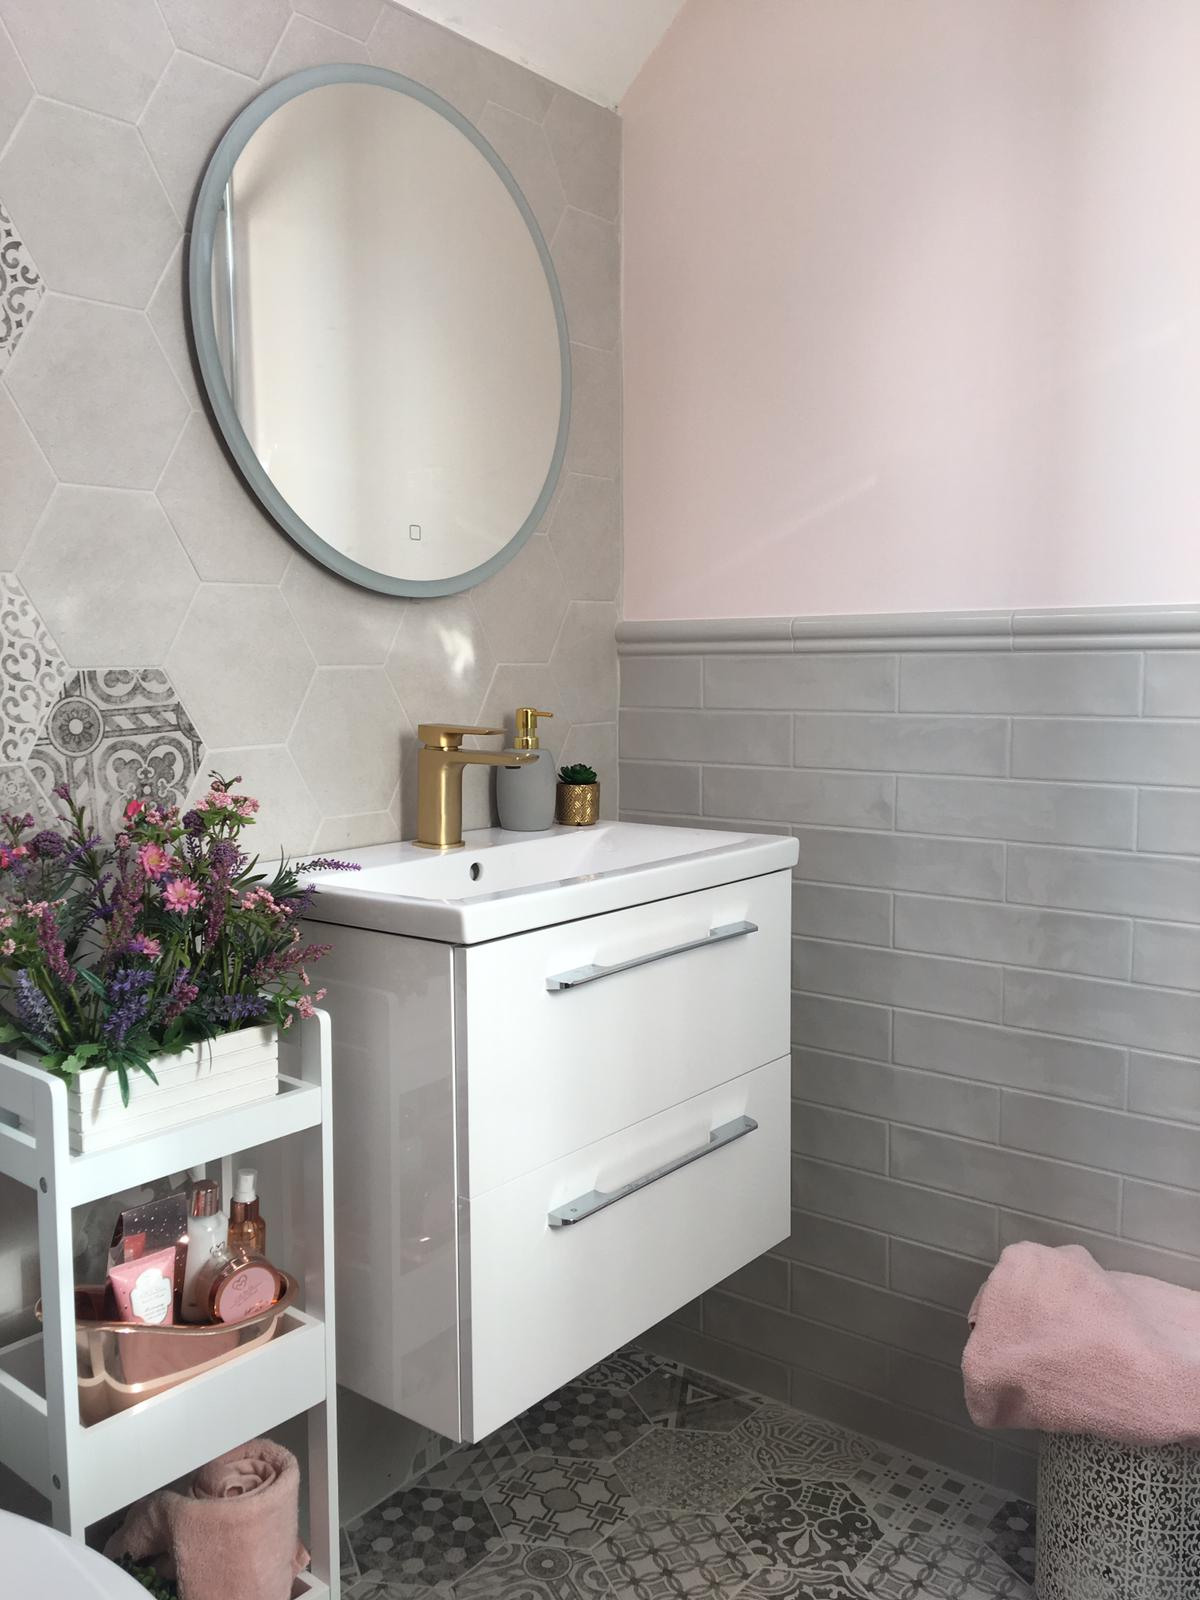 Macs Bathrooms - Bathroom Centre Northern Ireland   Bathroom Tiles County Down   Bathroom Design Ireland   Dundalk   County Louth   County Meath